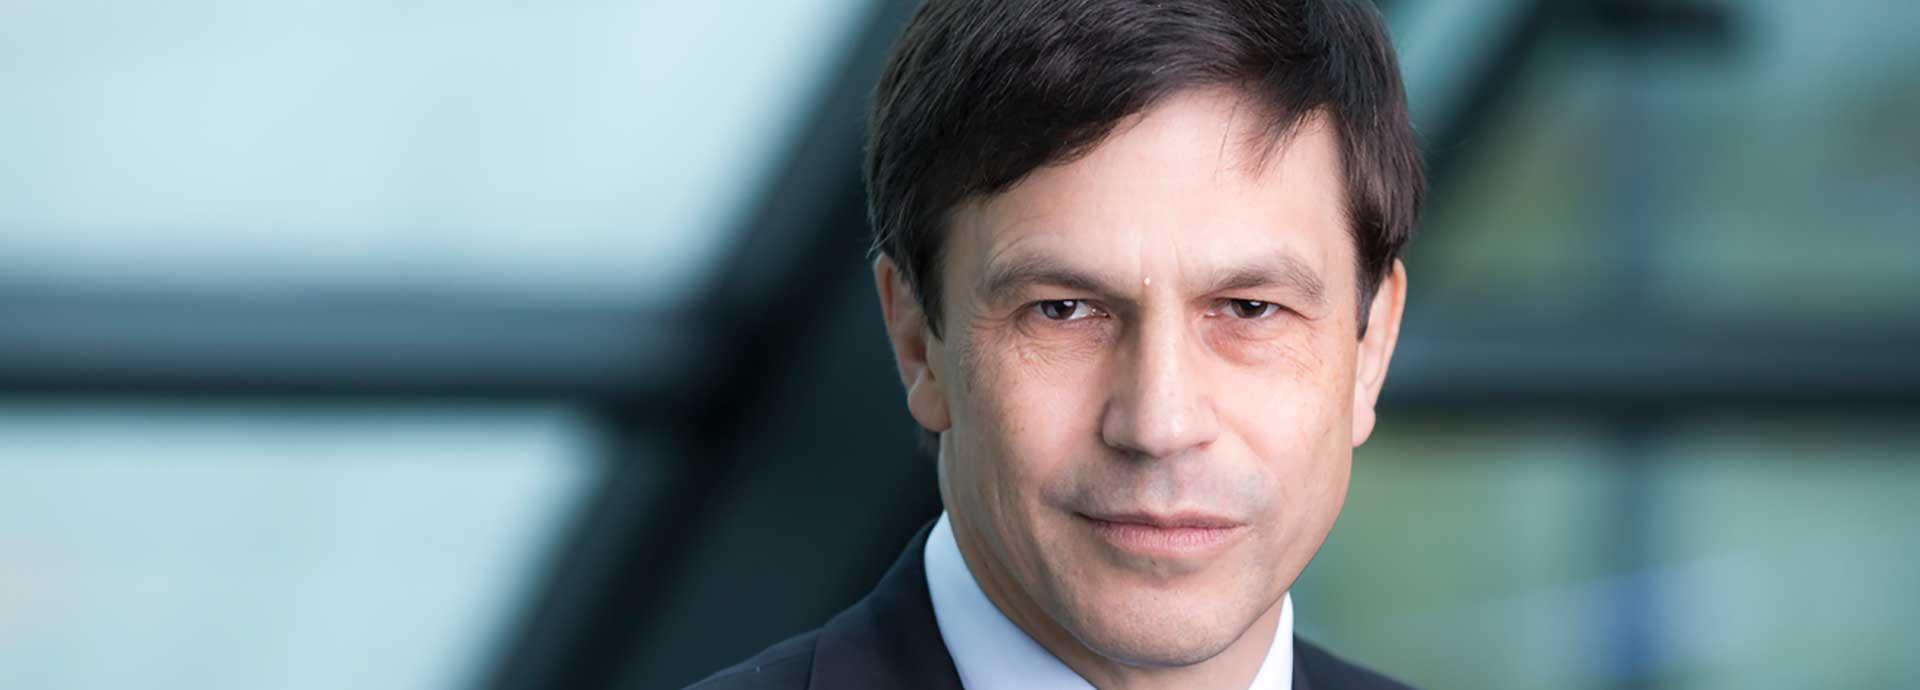 Michael Wilshire from Bloomberg New Energy Finance